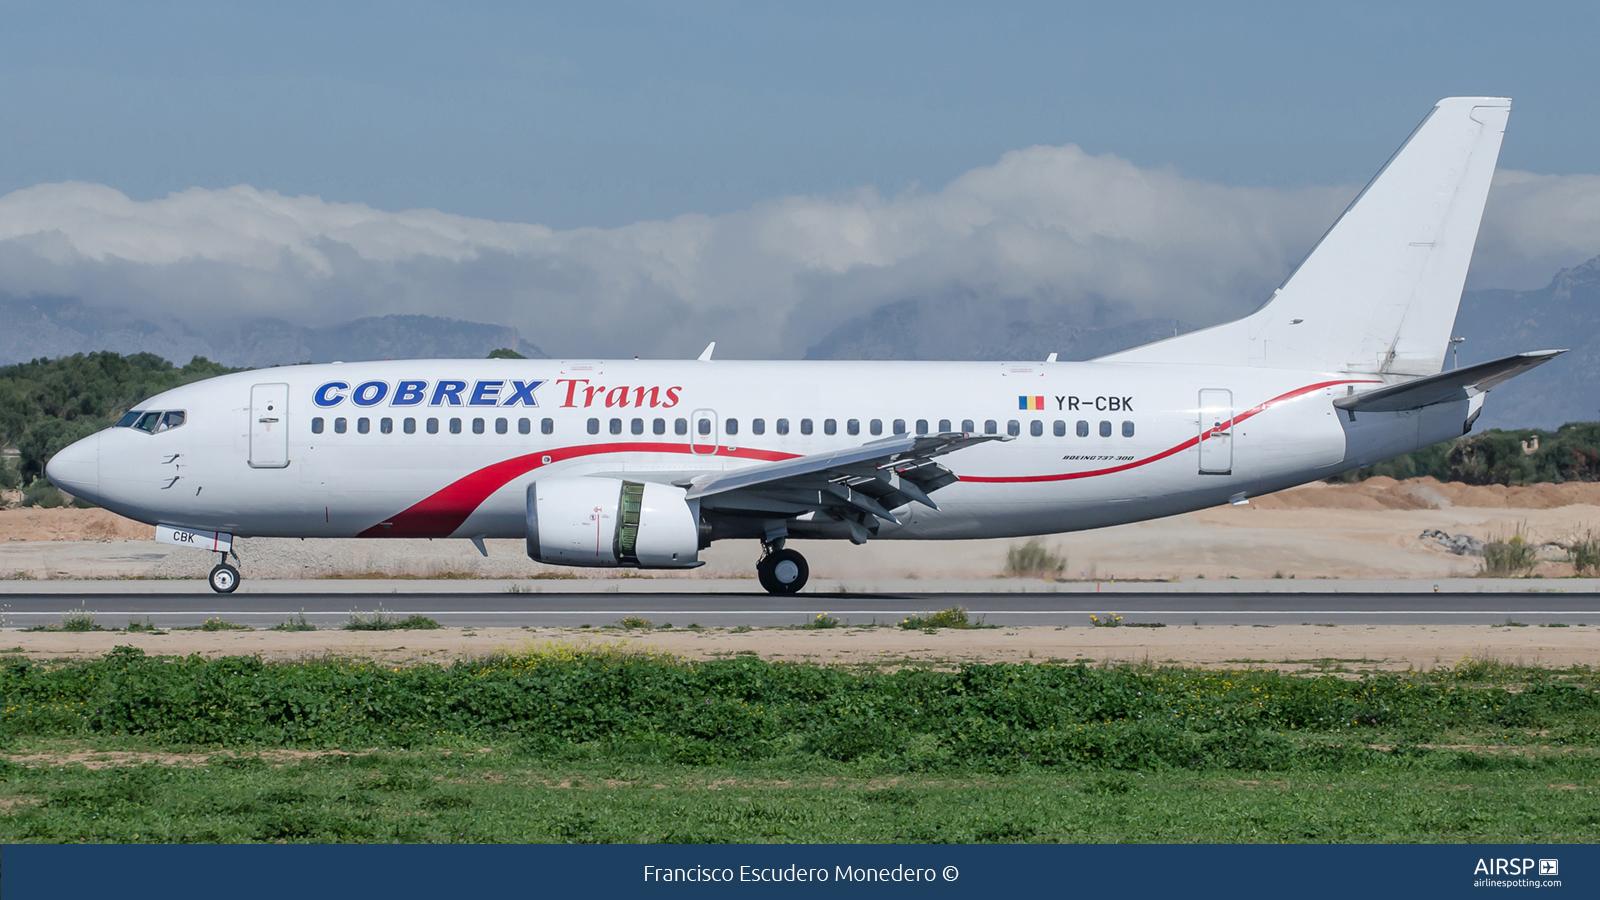 Cobrex Trans  Boeing 737-300  YR-CBK